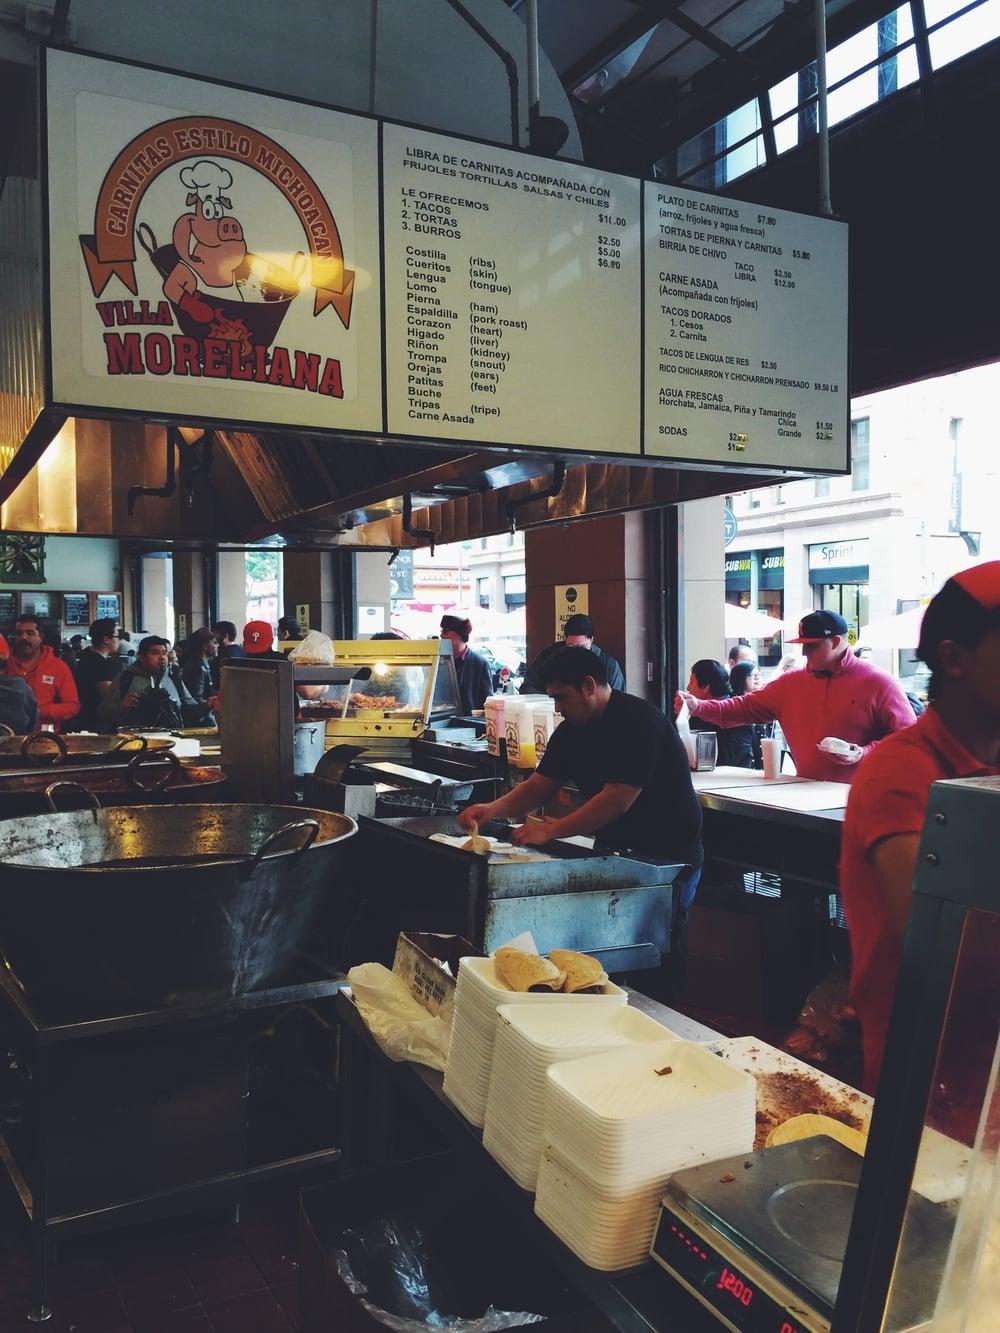 carnitas tacos at villa morelina grand central market dtla